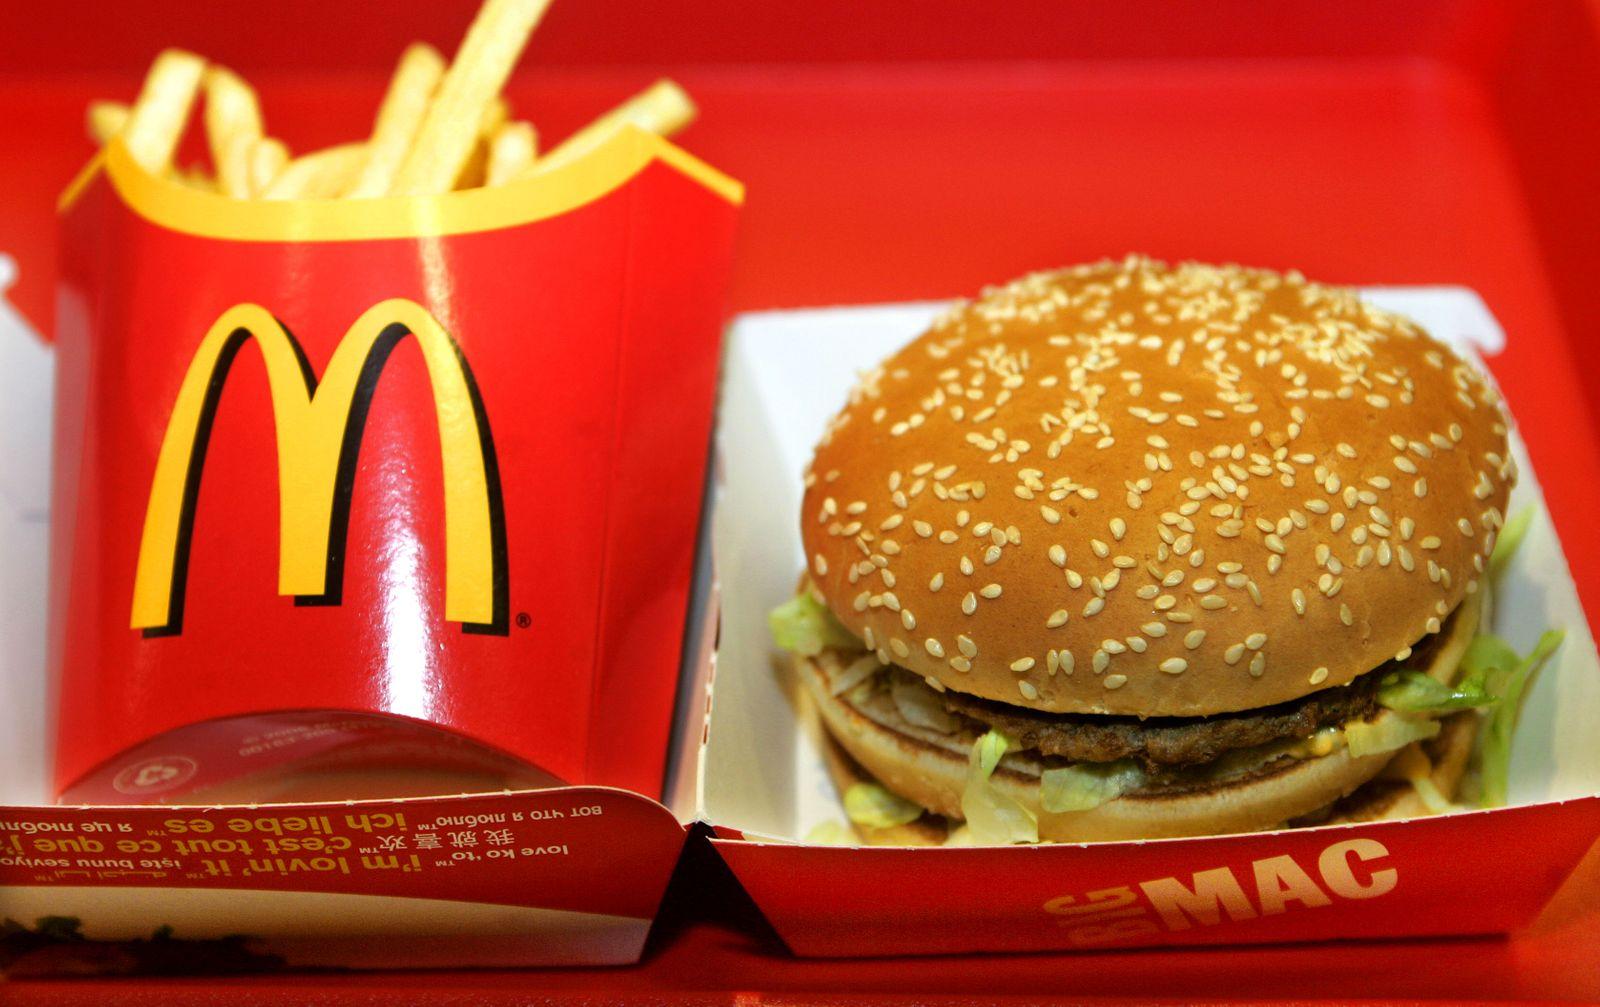 McDonald's / Pommes / Big Mac / Hamburger / Cheeseburger / Fast Food